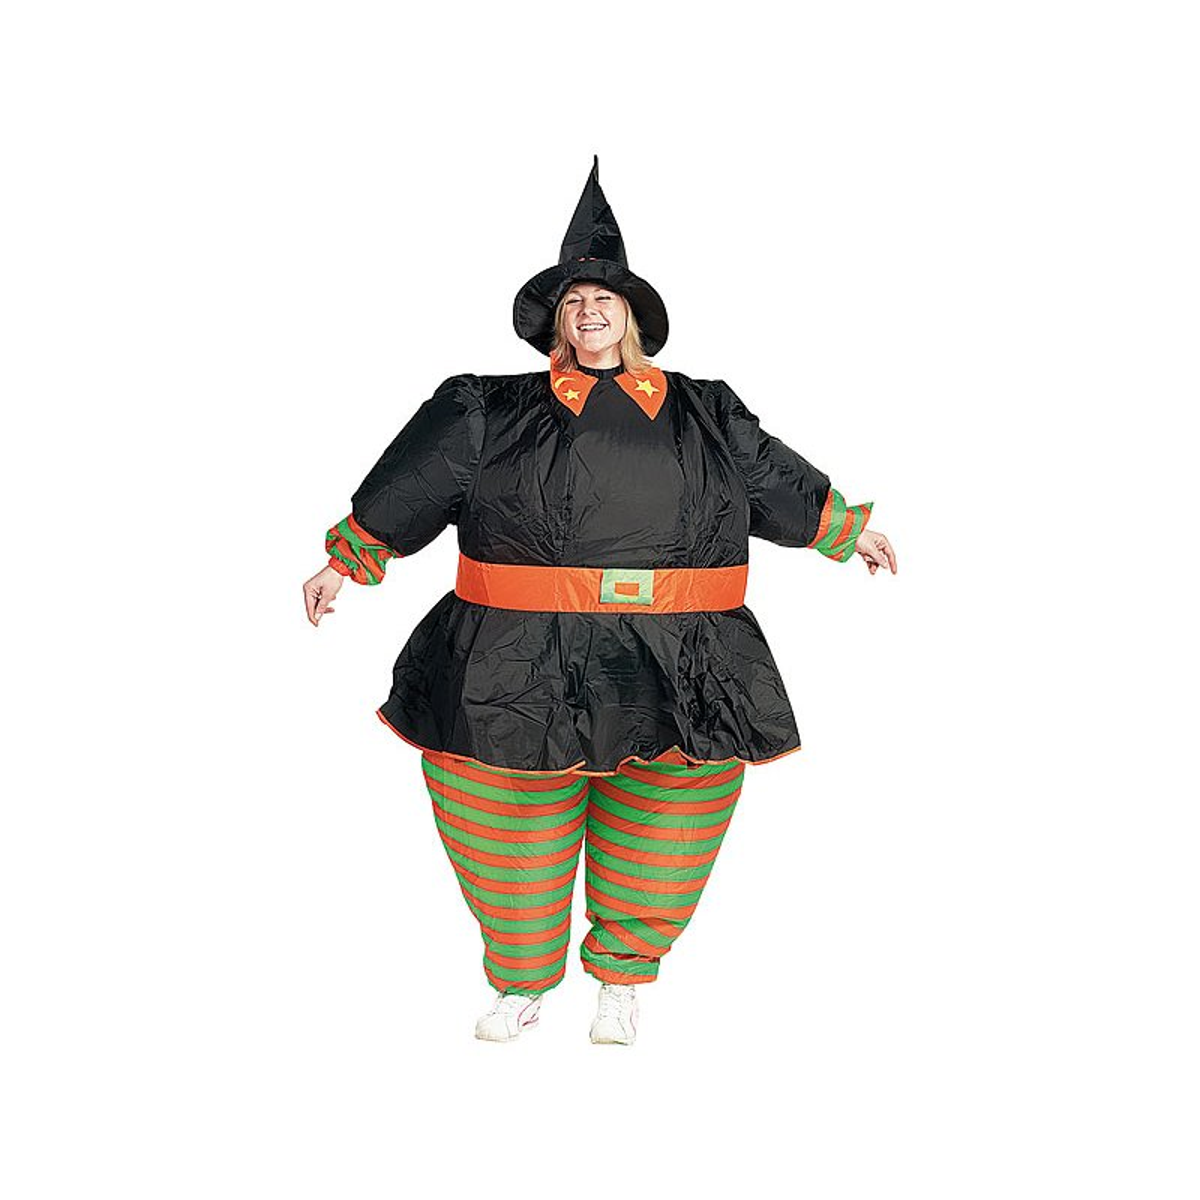 Playtastic Selbstaufblasendes Kostüm Hexe